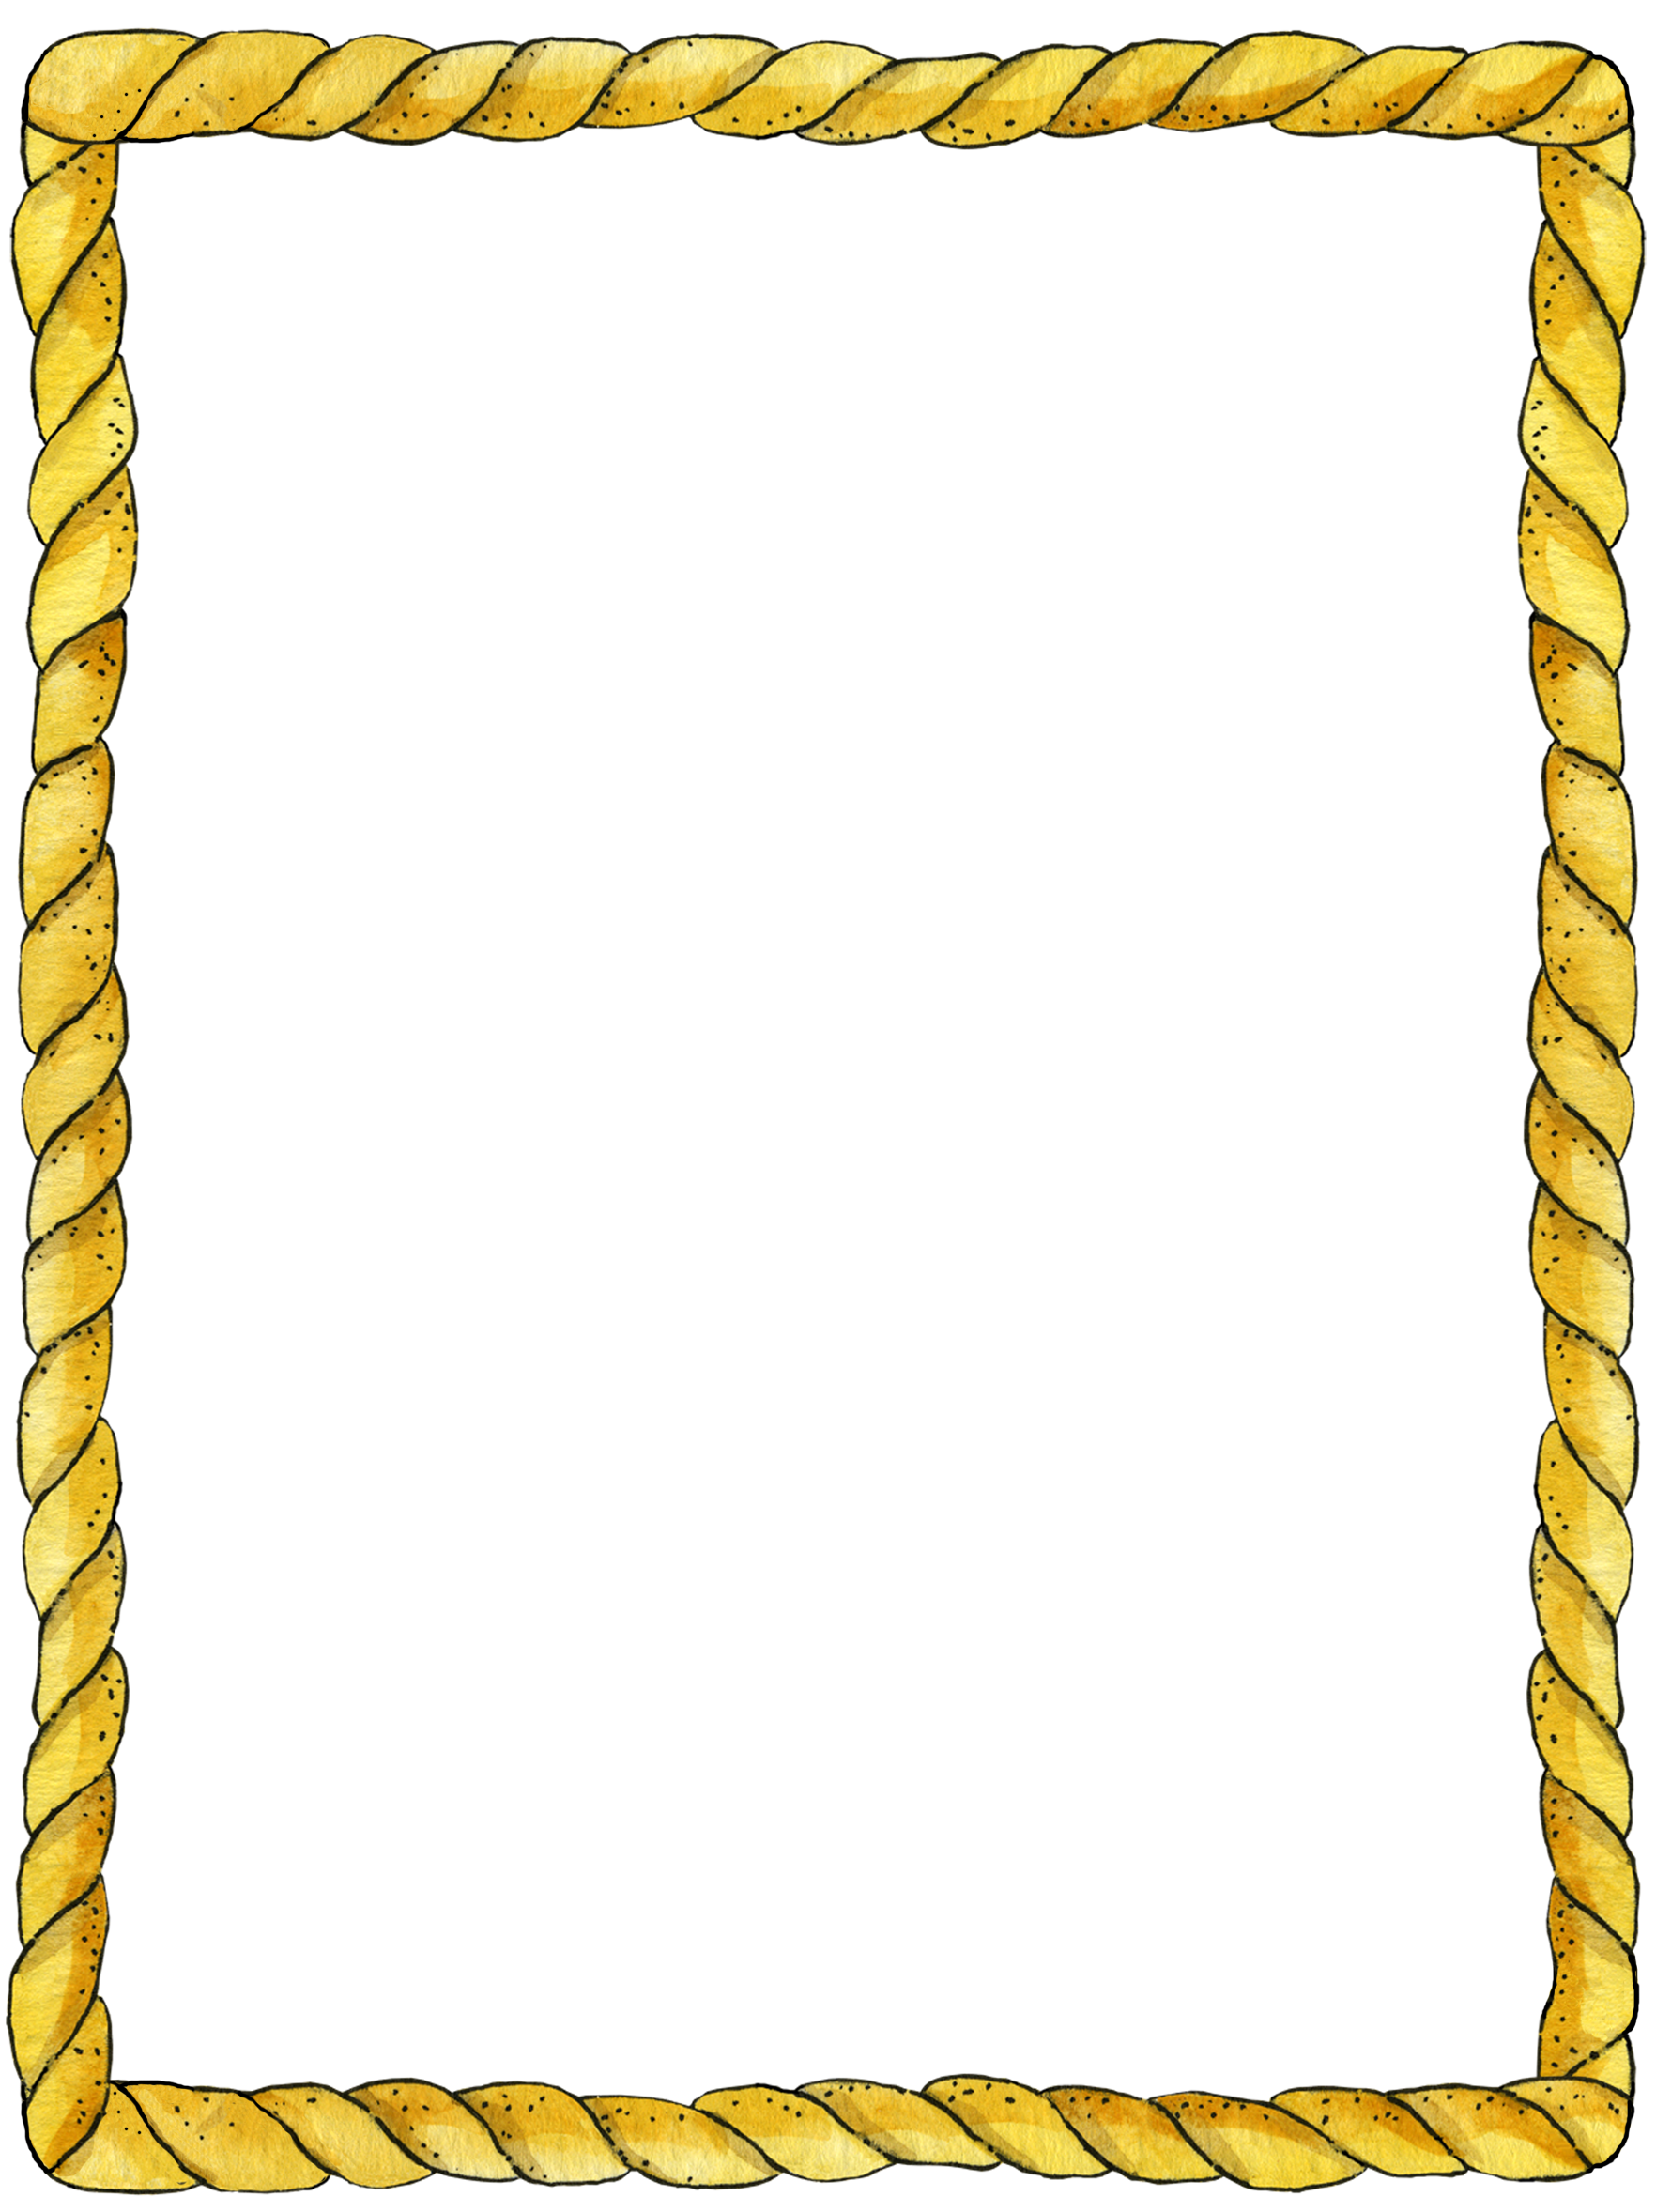 Rope frame border and corner designs pinterest rope for Paper border